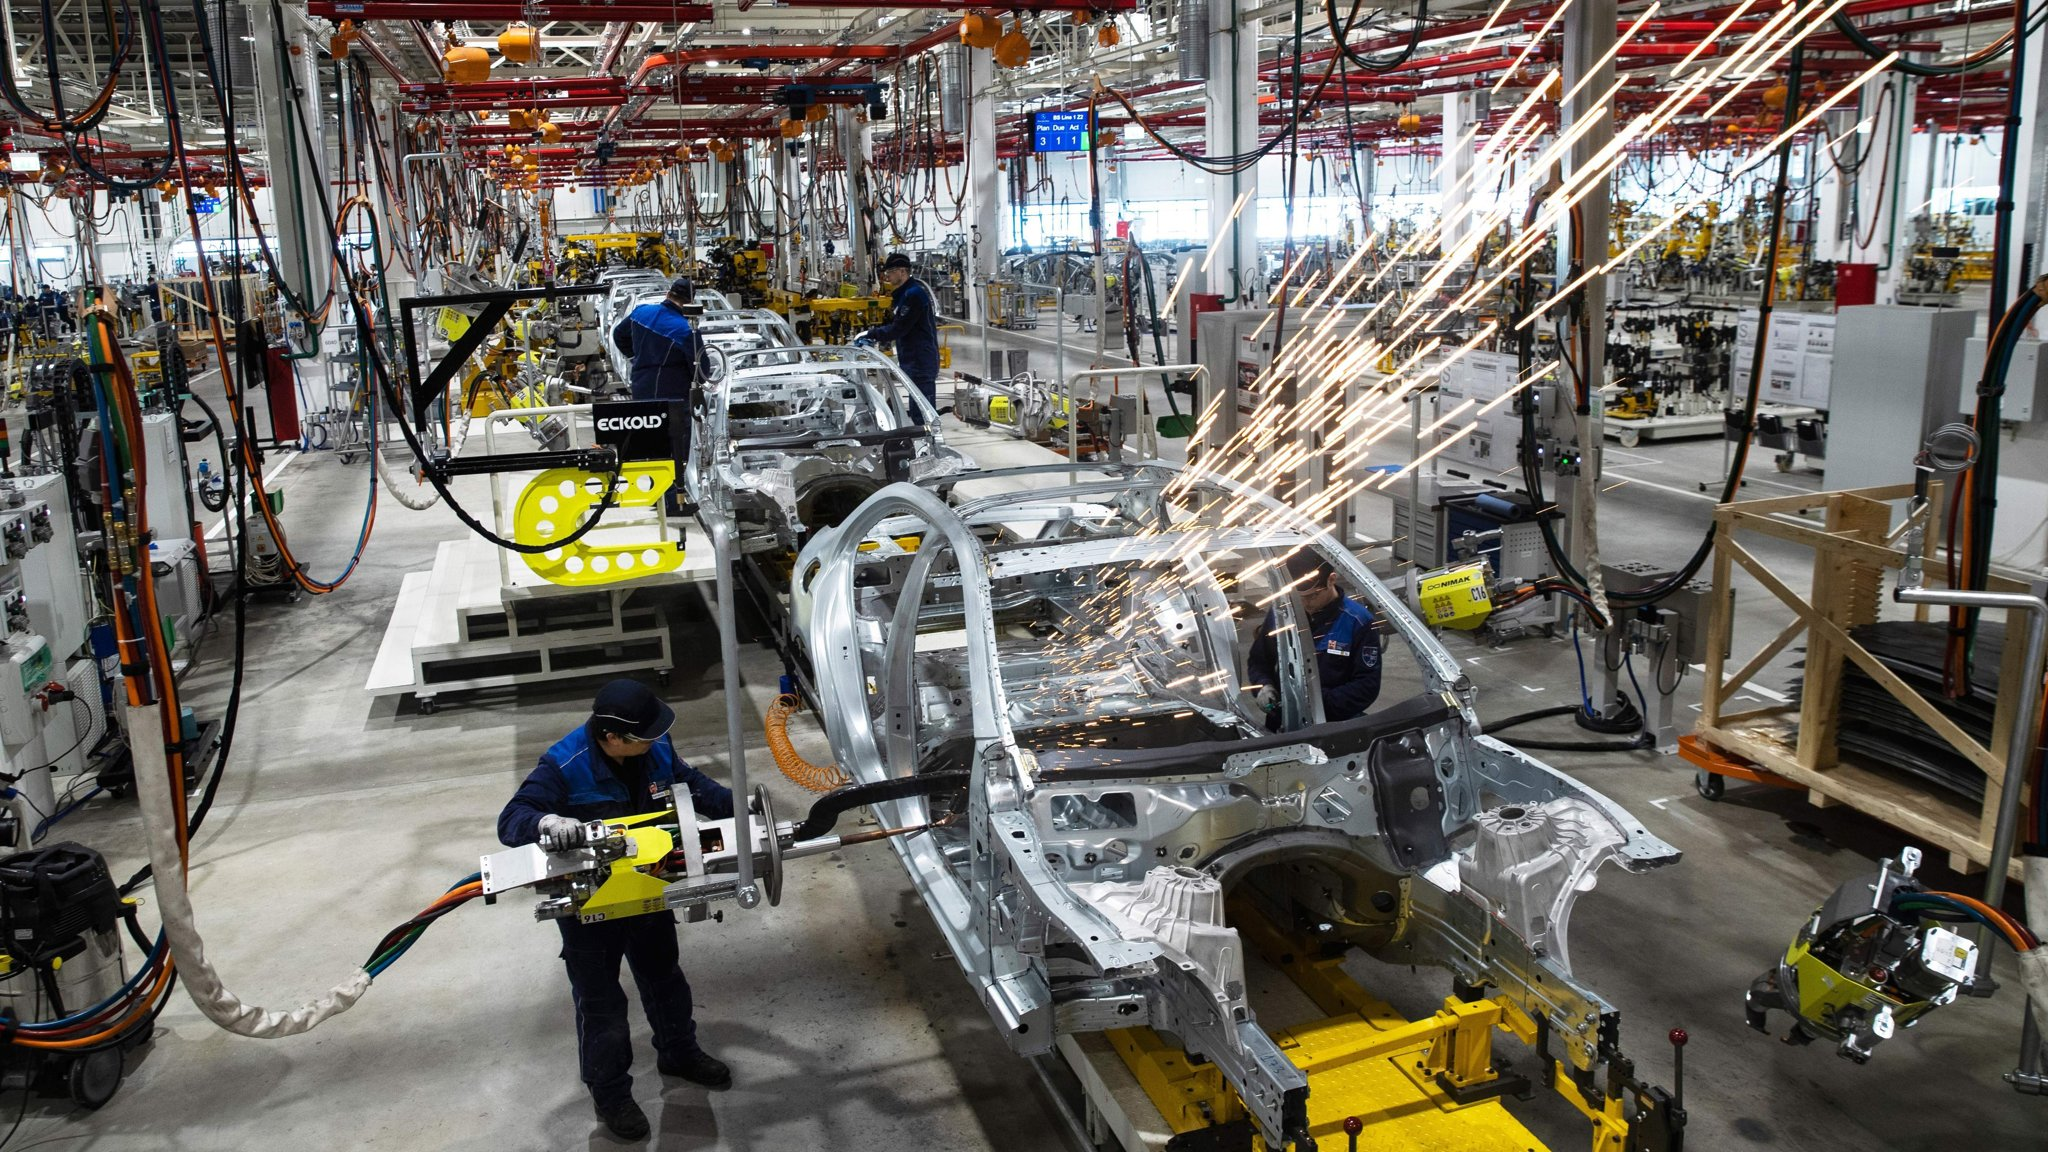 Decline of motor industry drives global economic slowdown   Financial Times